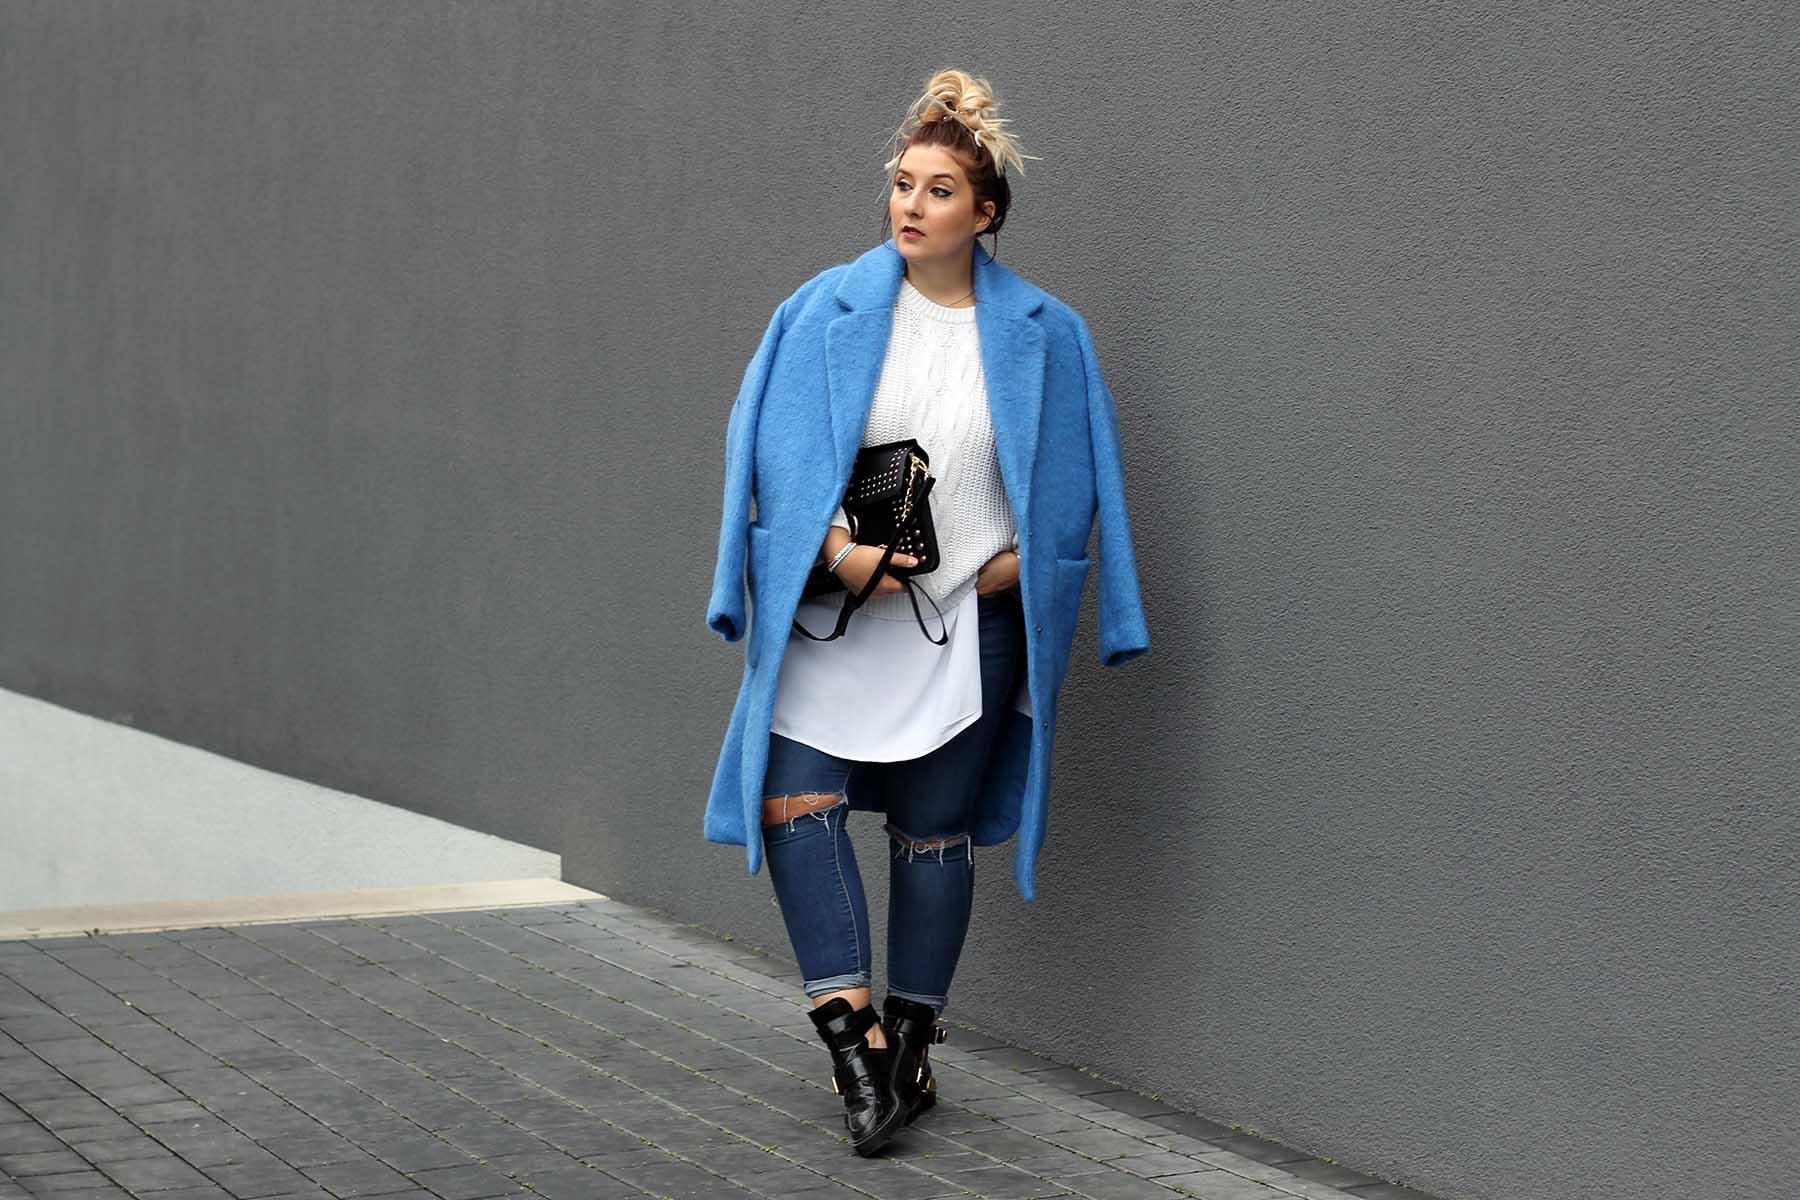 outfit-look-style-modeblog-fashionblog-blauer-mantel-jeans-balenciaga-lookalike-boots-chloe10